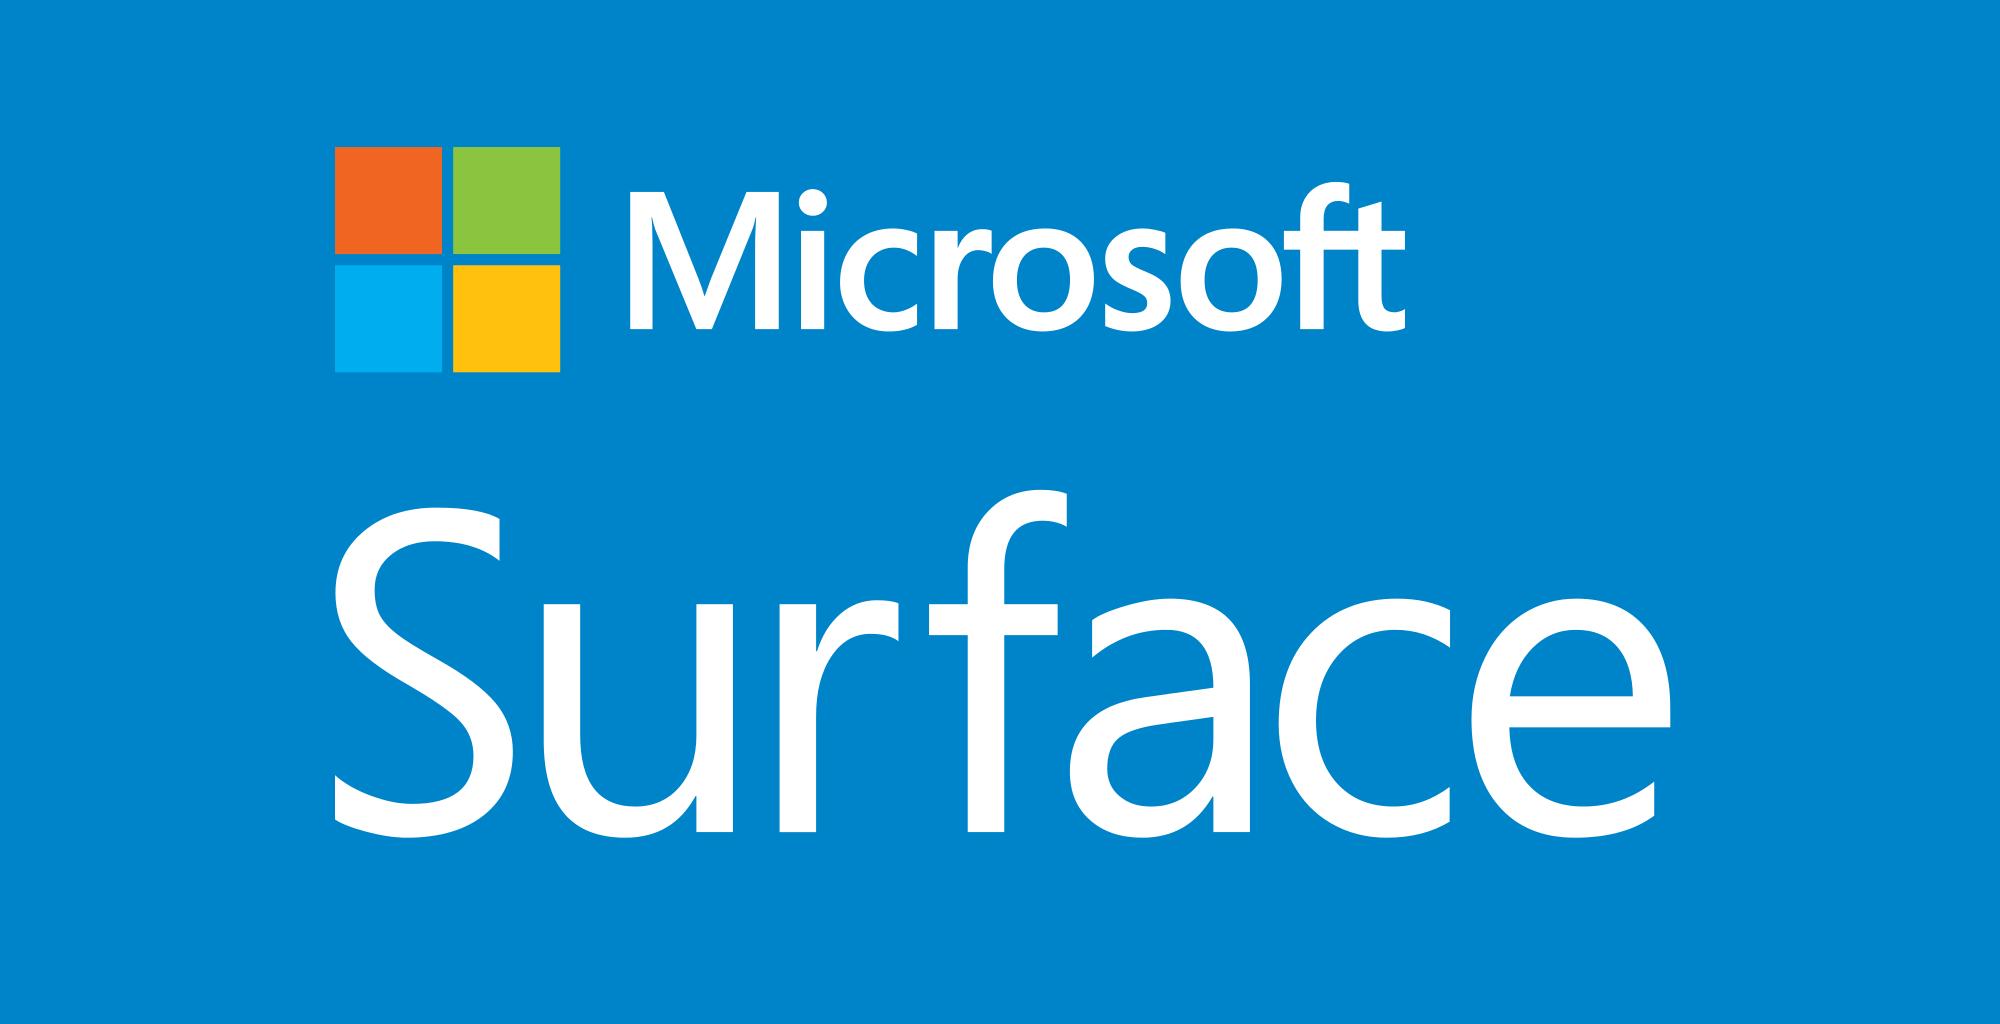 microsoft surface customer service complaints department